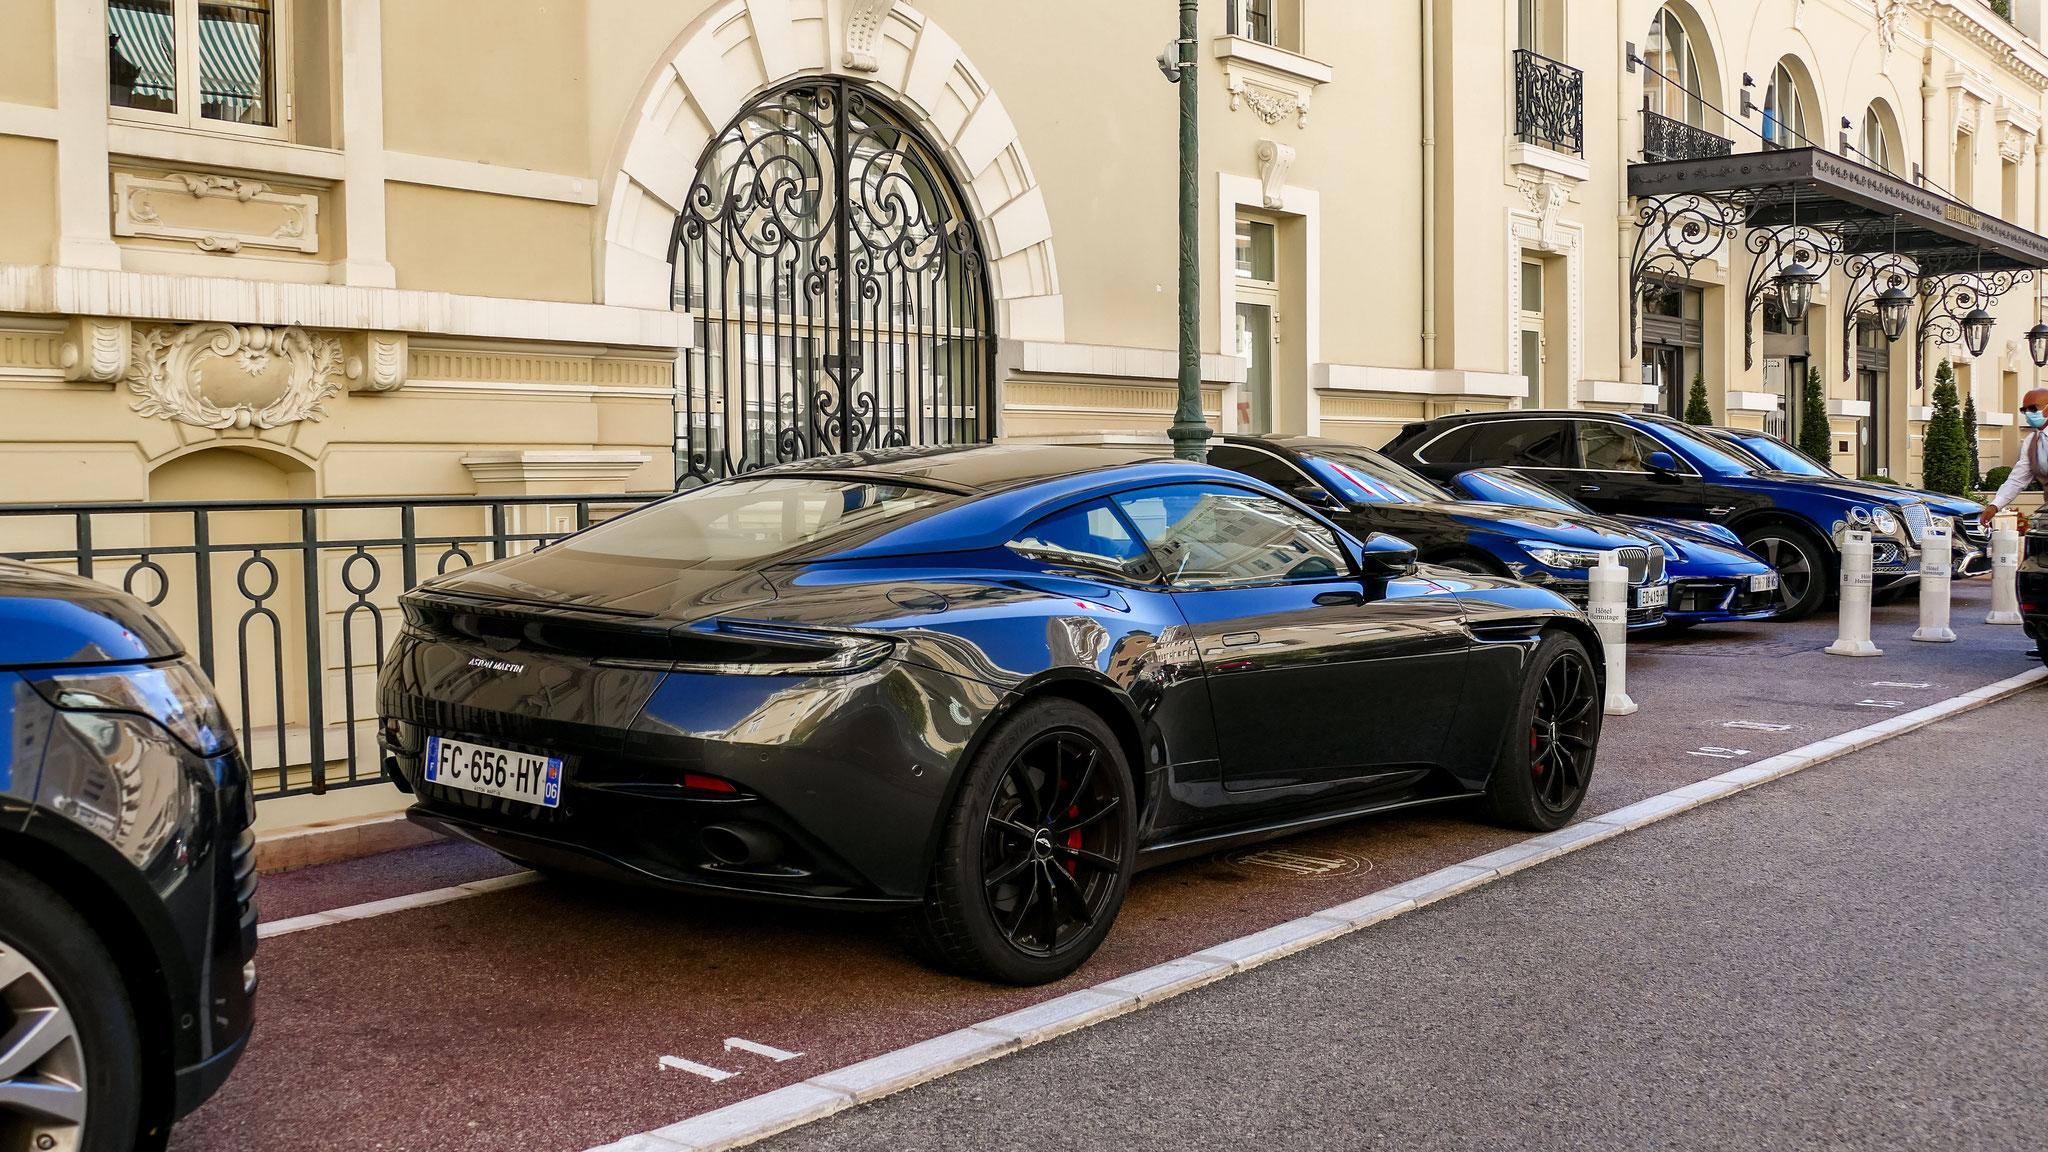 Aston Martin DB11 - FC-656-HY-06 (FRA)